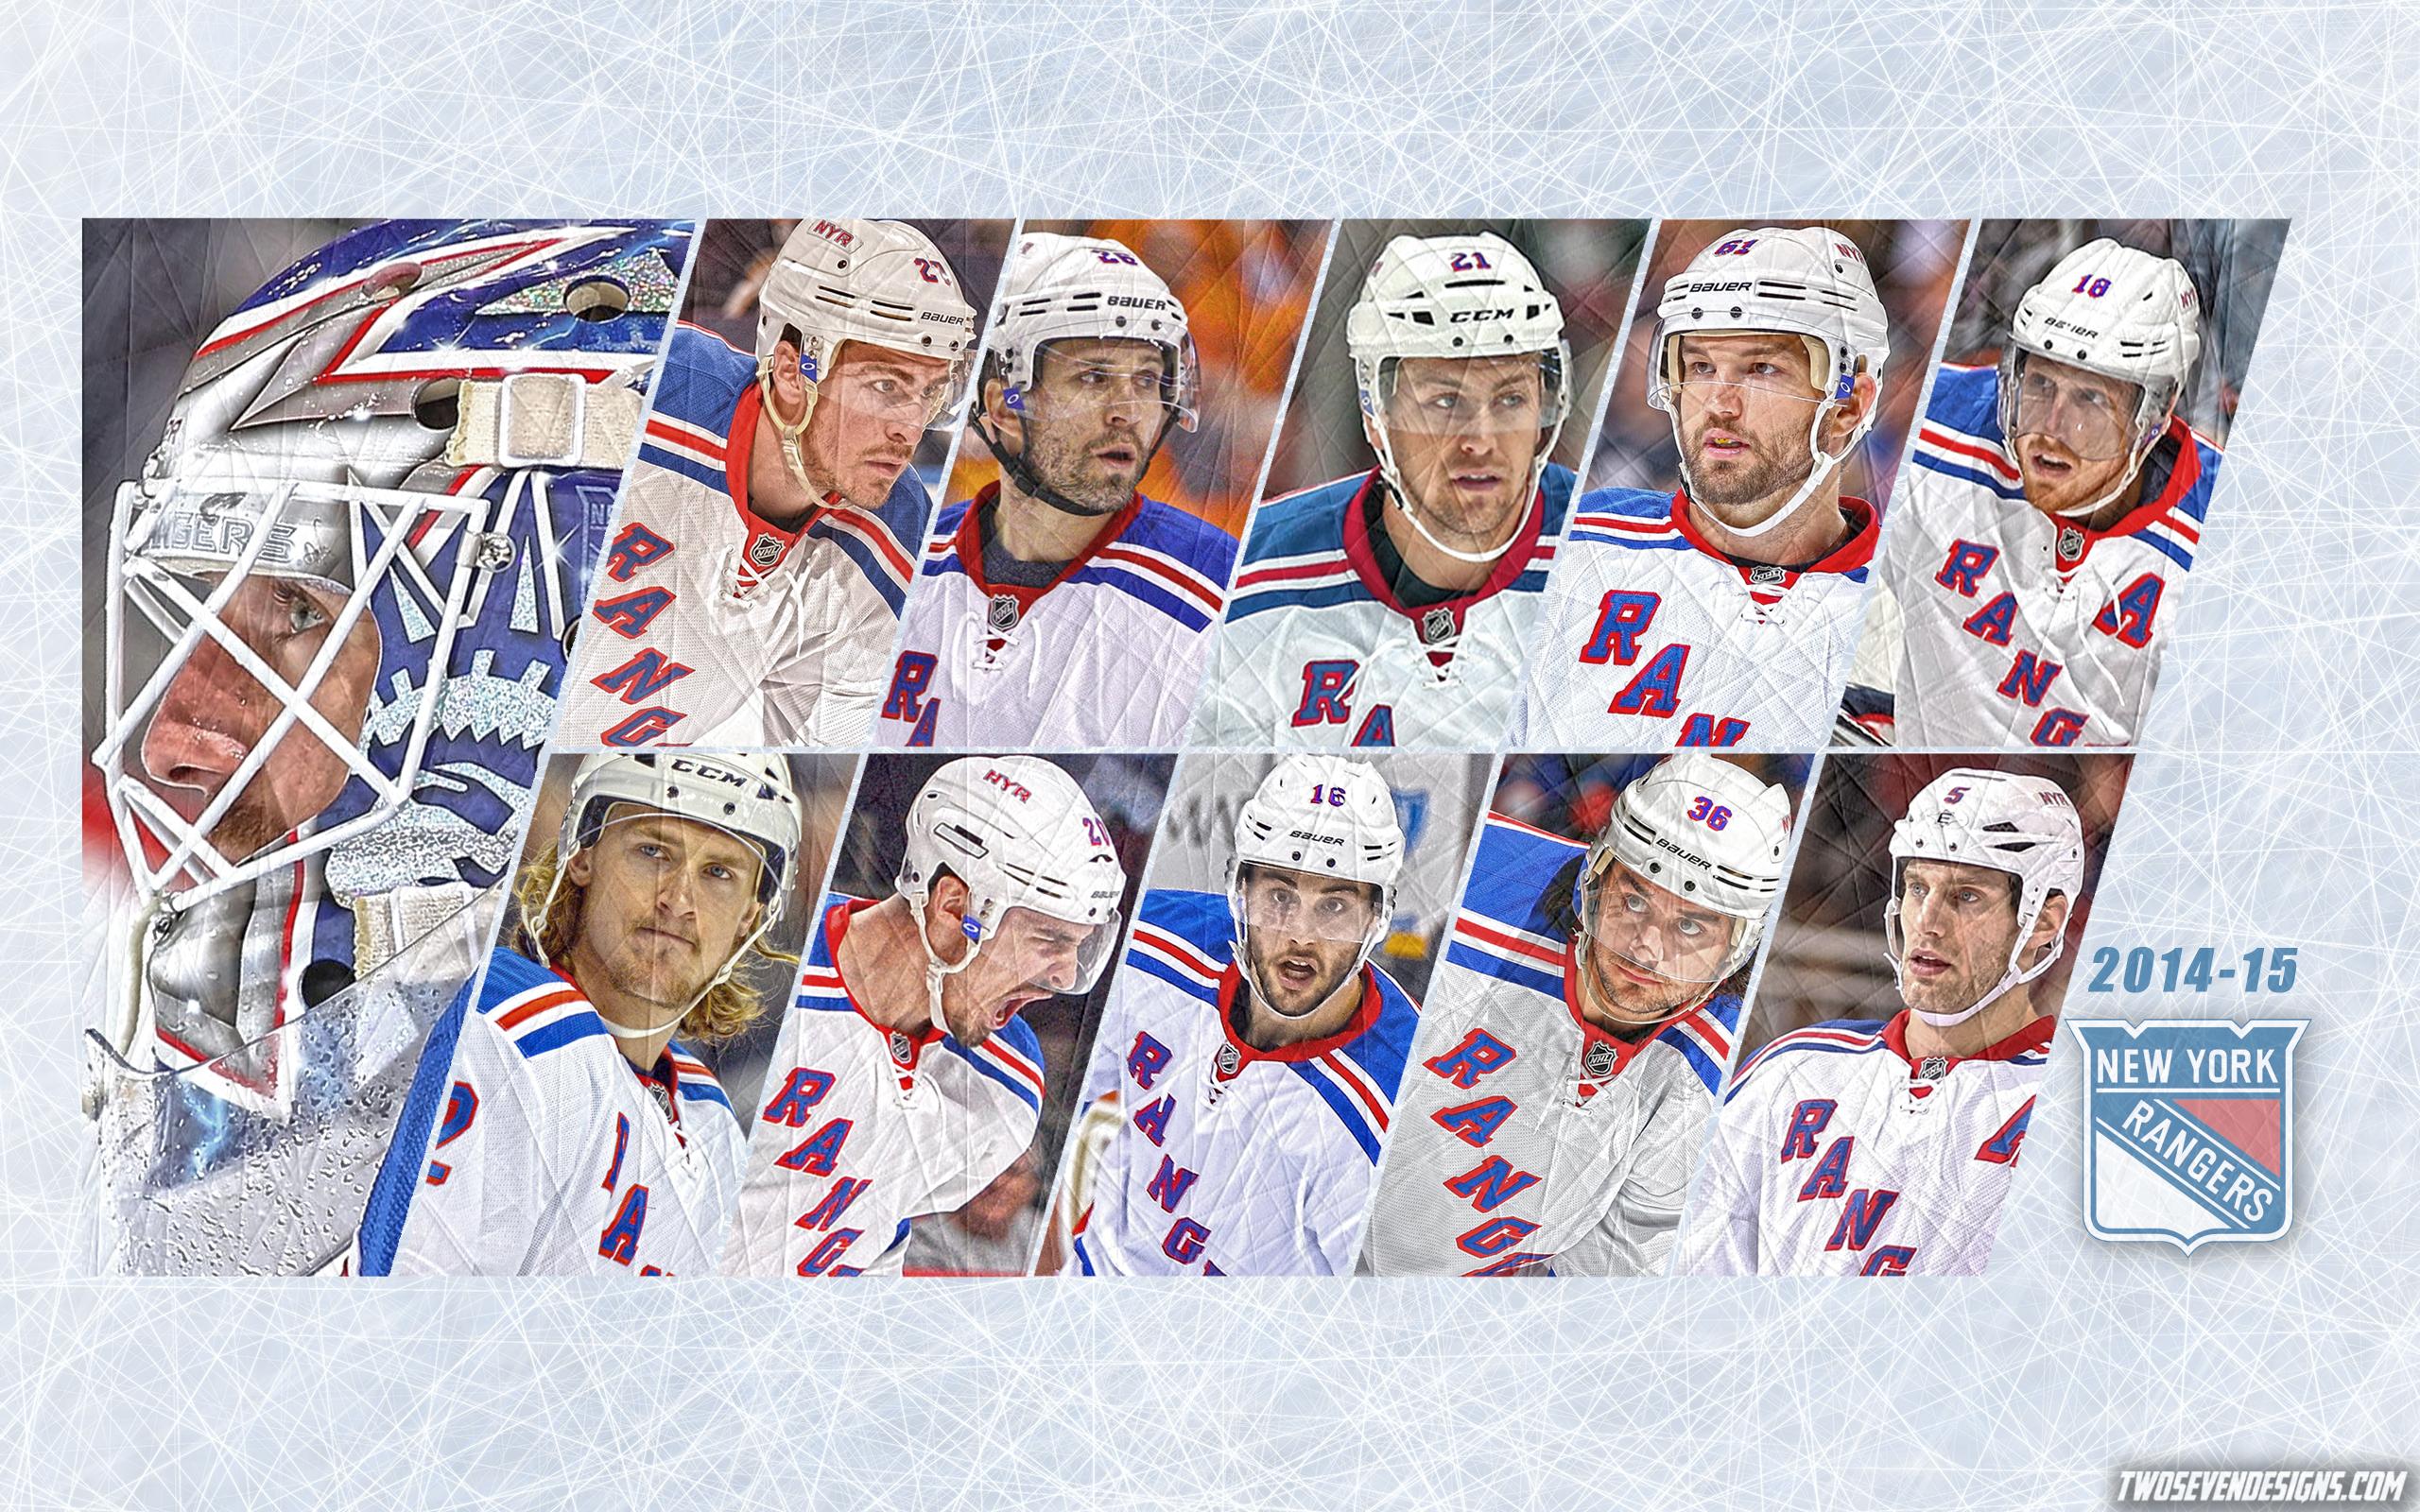 New York Rangers Iphone Wallpaper: 2014-15 New York Rangers Wallpaper